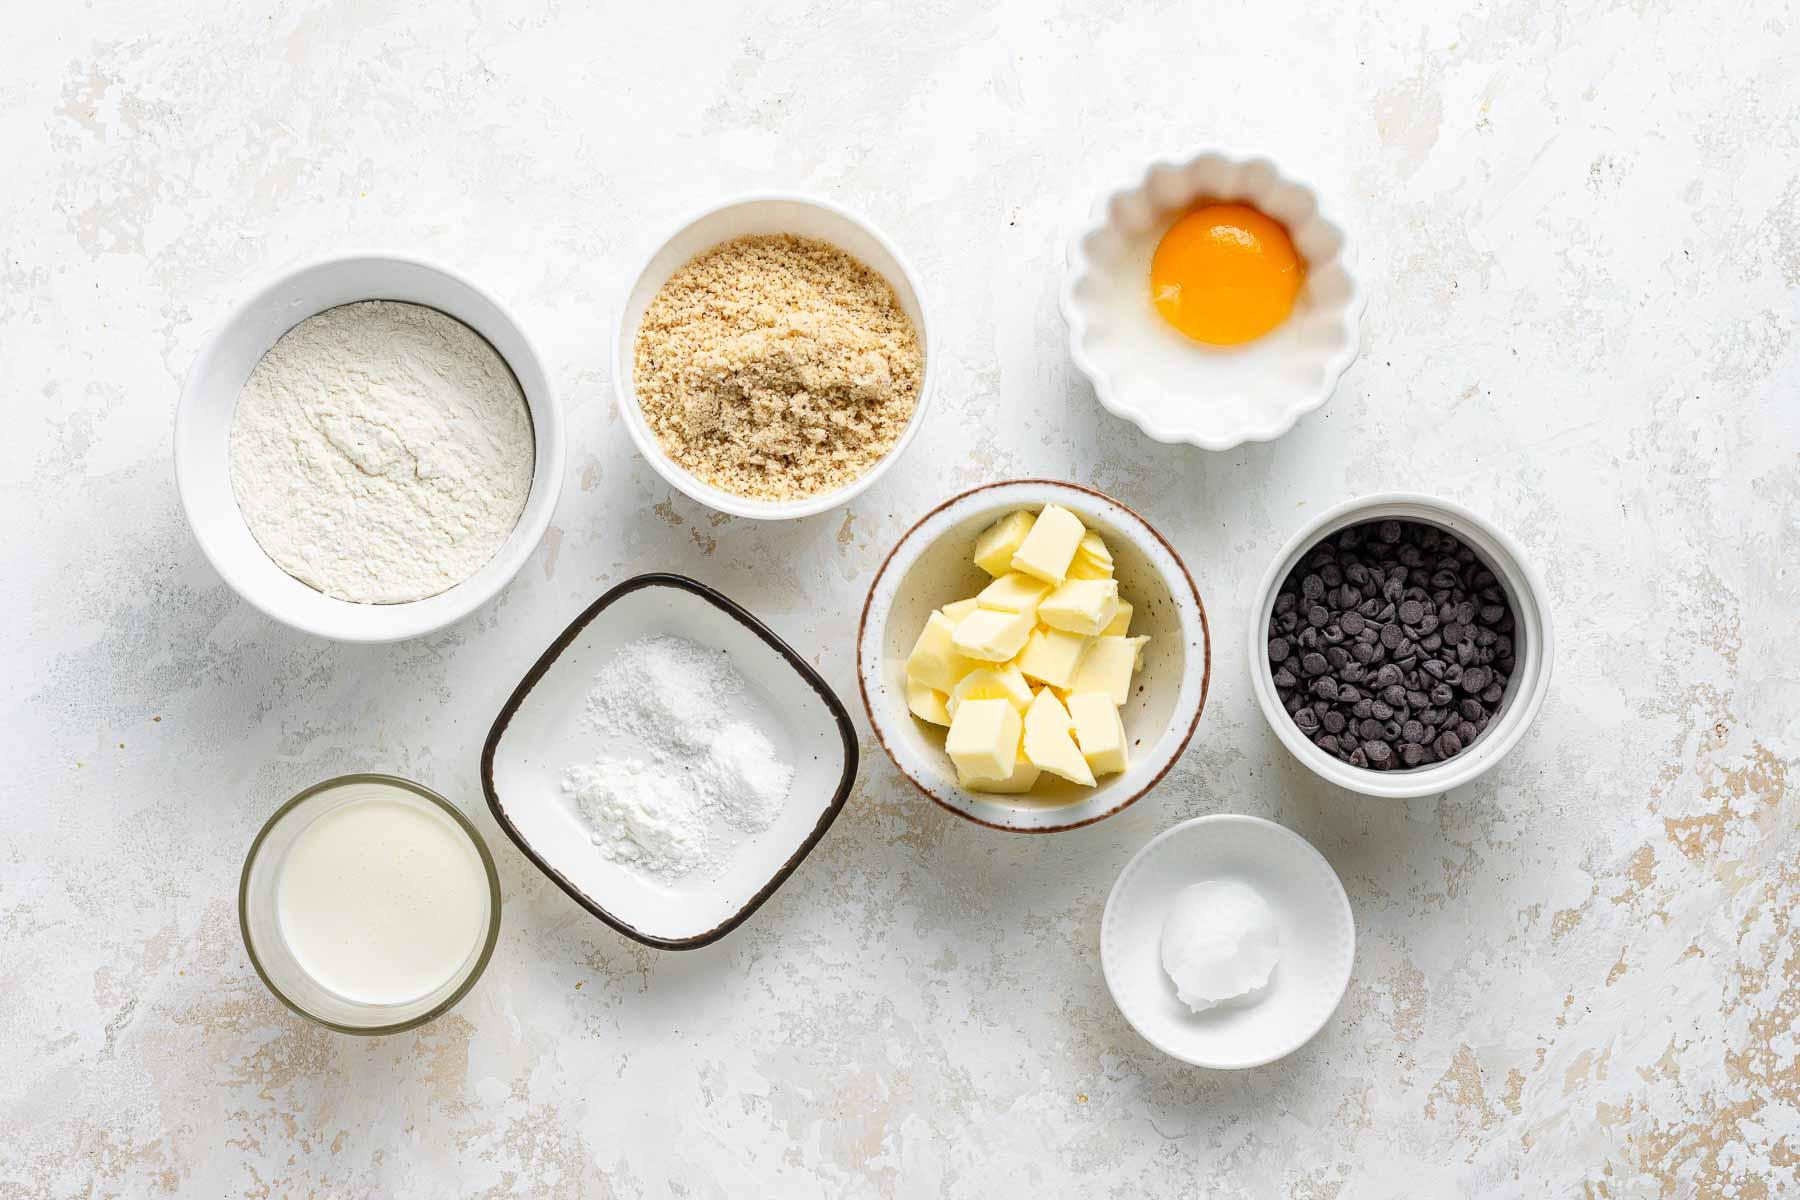 Ingredients for hazelnut meal cookies.